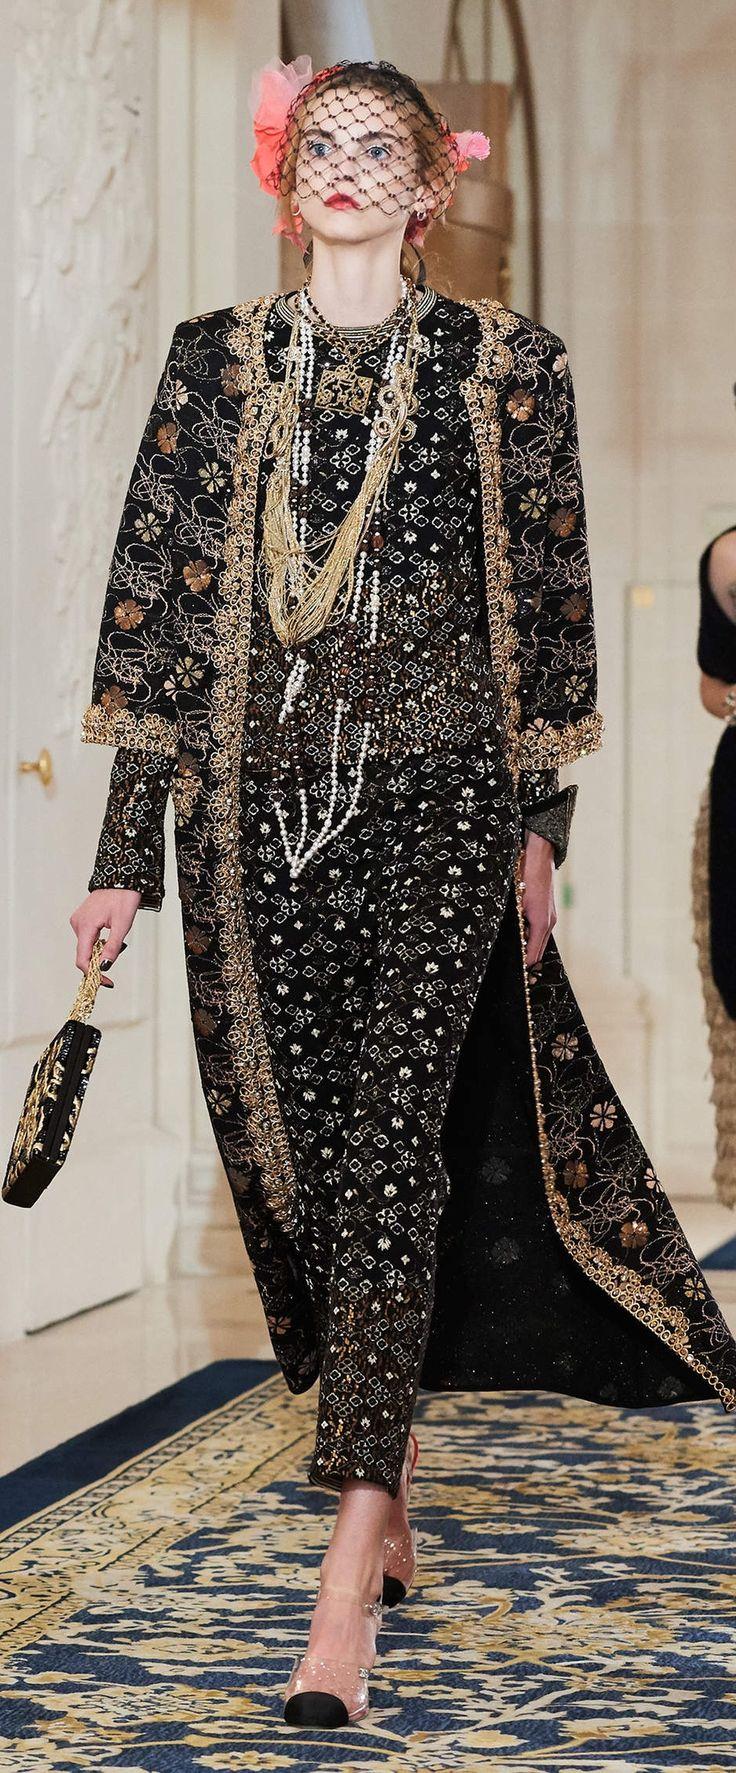 Chanel prefall 2017 show in Hotel Ritz Paris